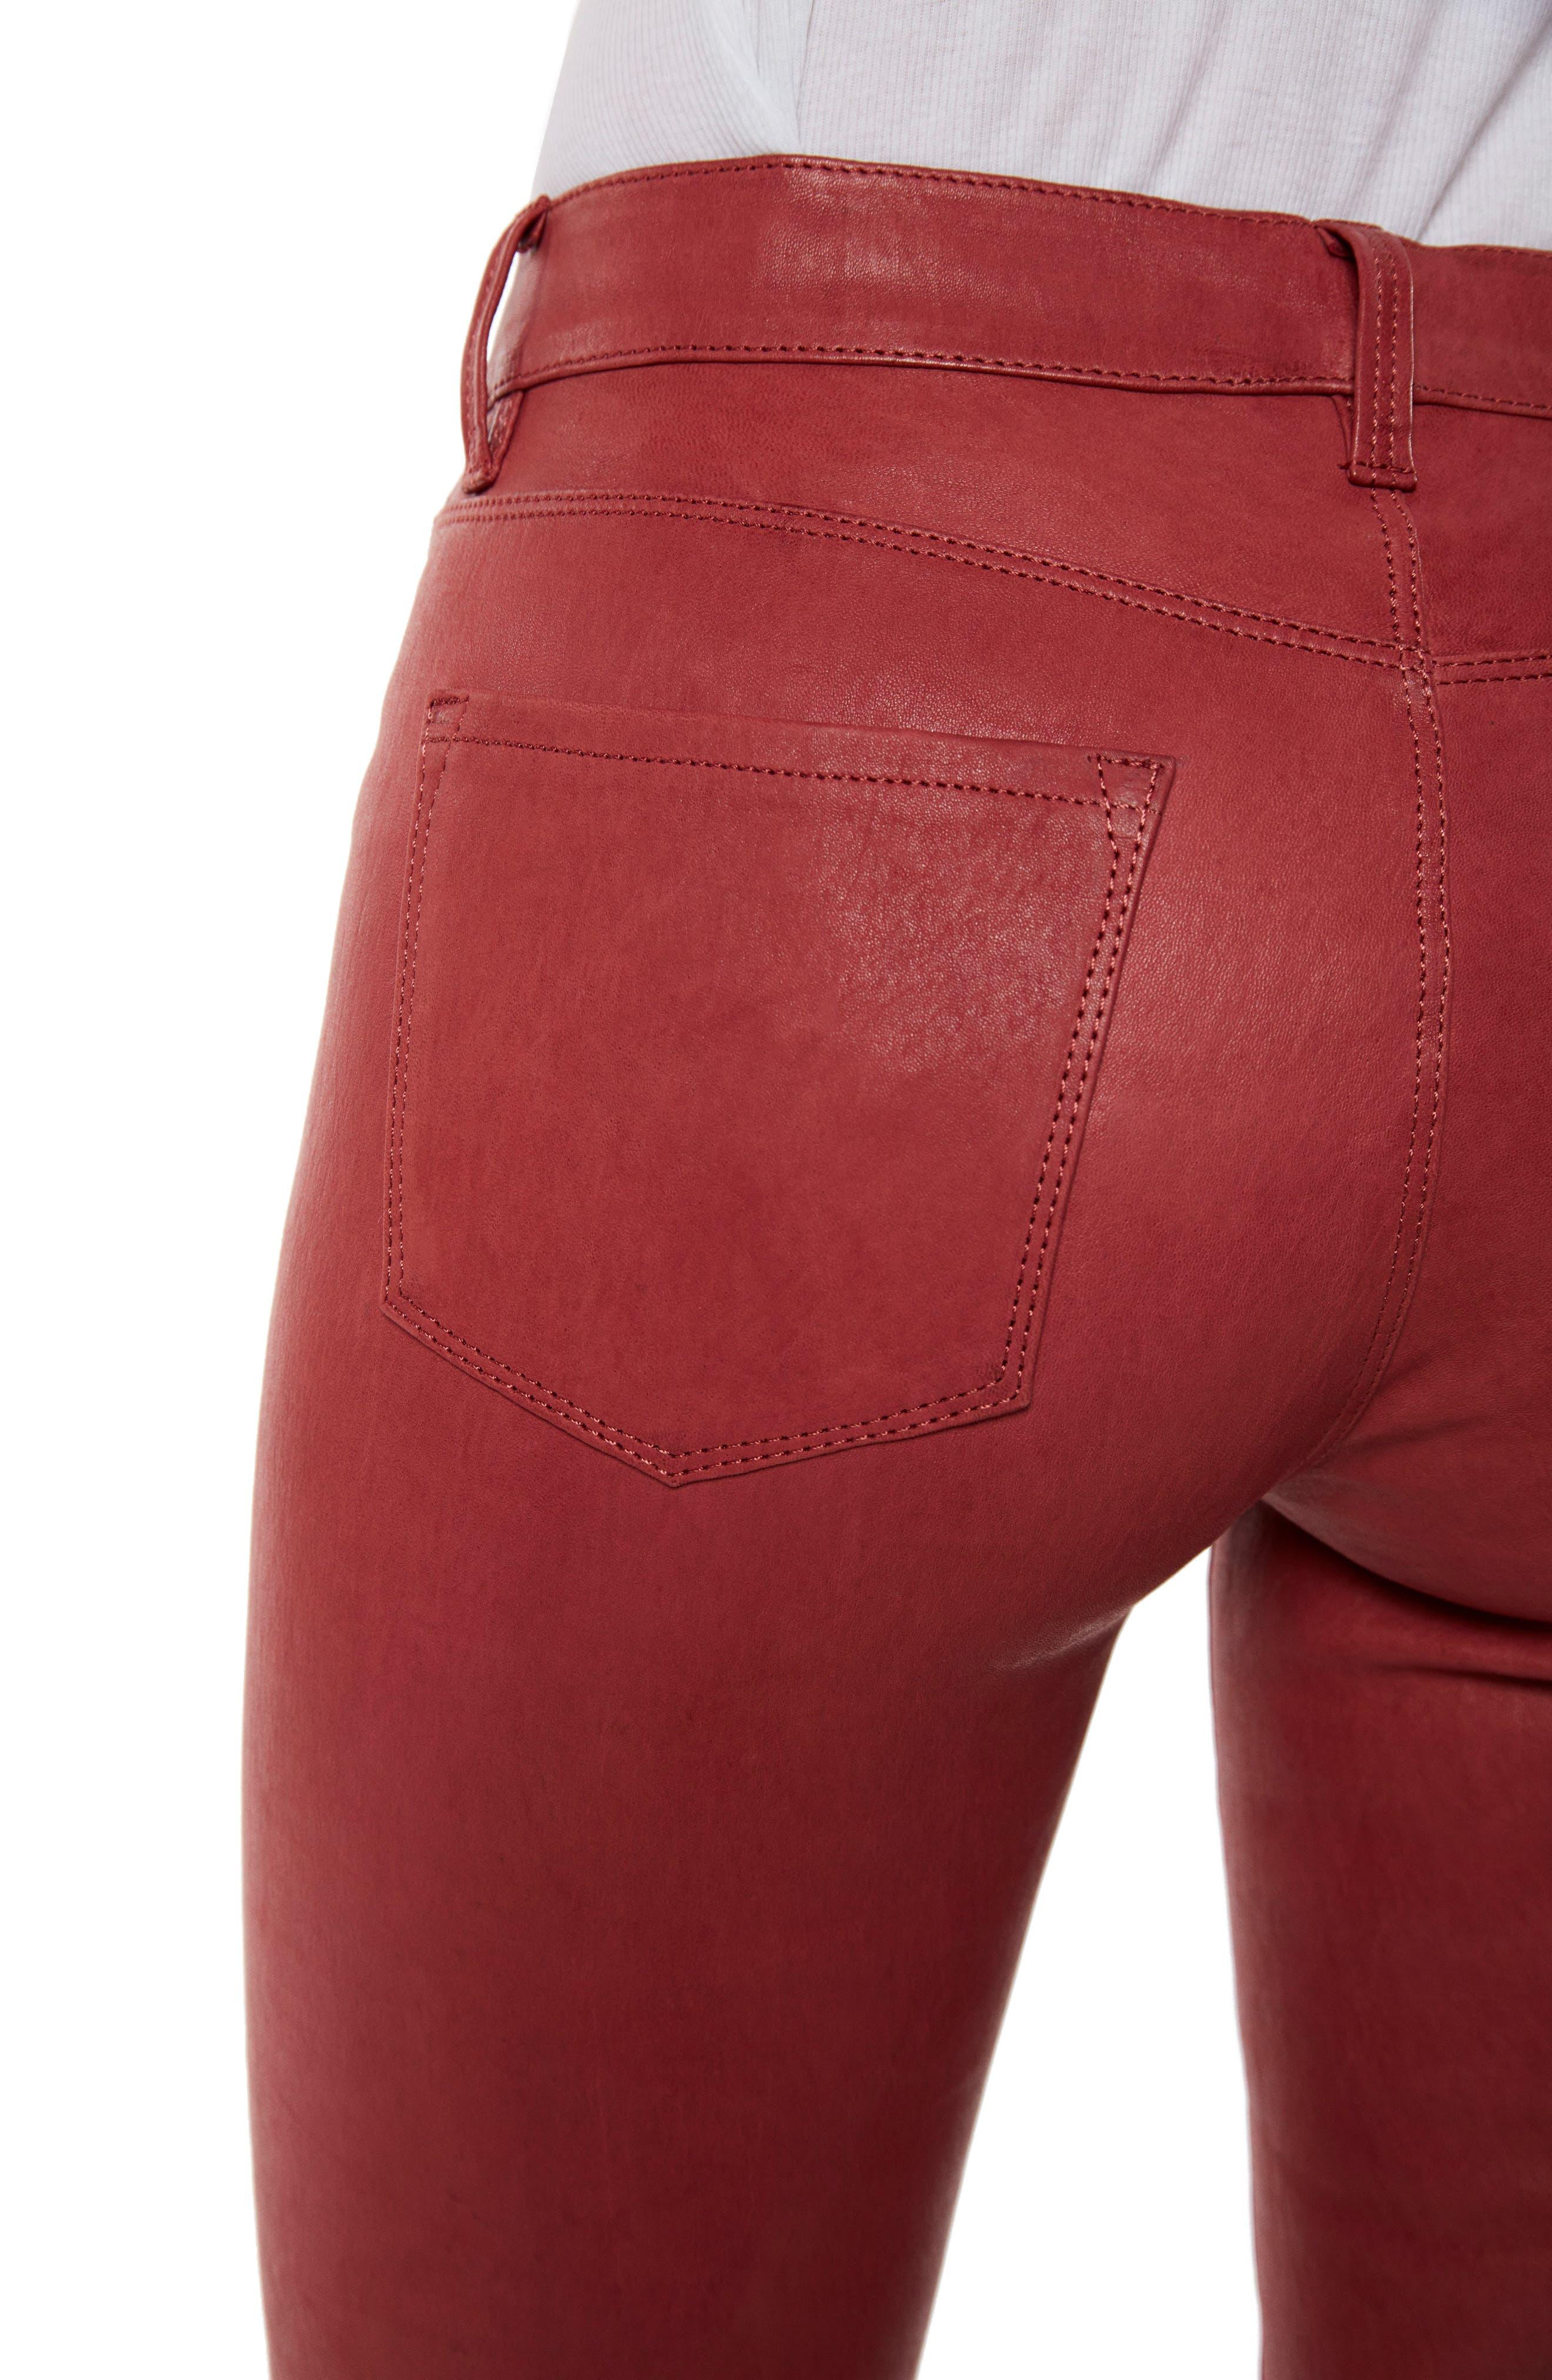 '8001' Lambskin Leather Pants,                             Alternate thumbnail 67, color,